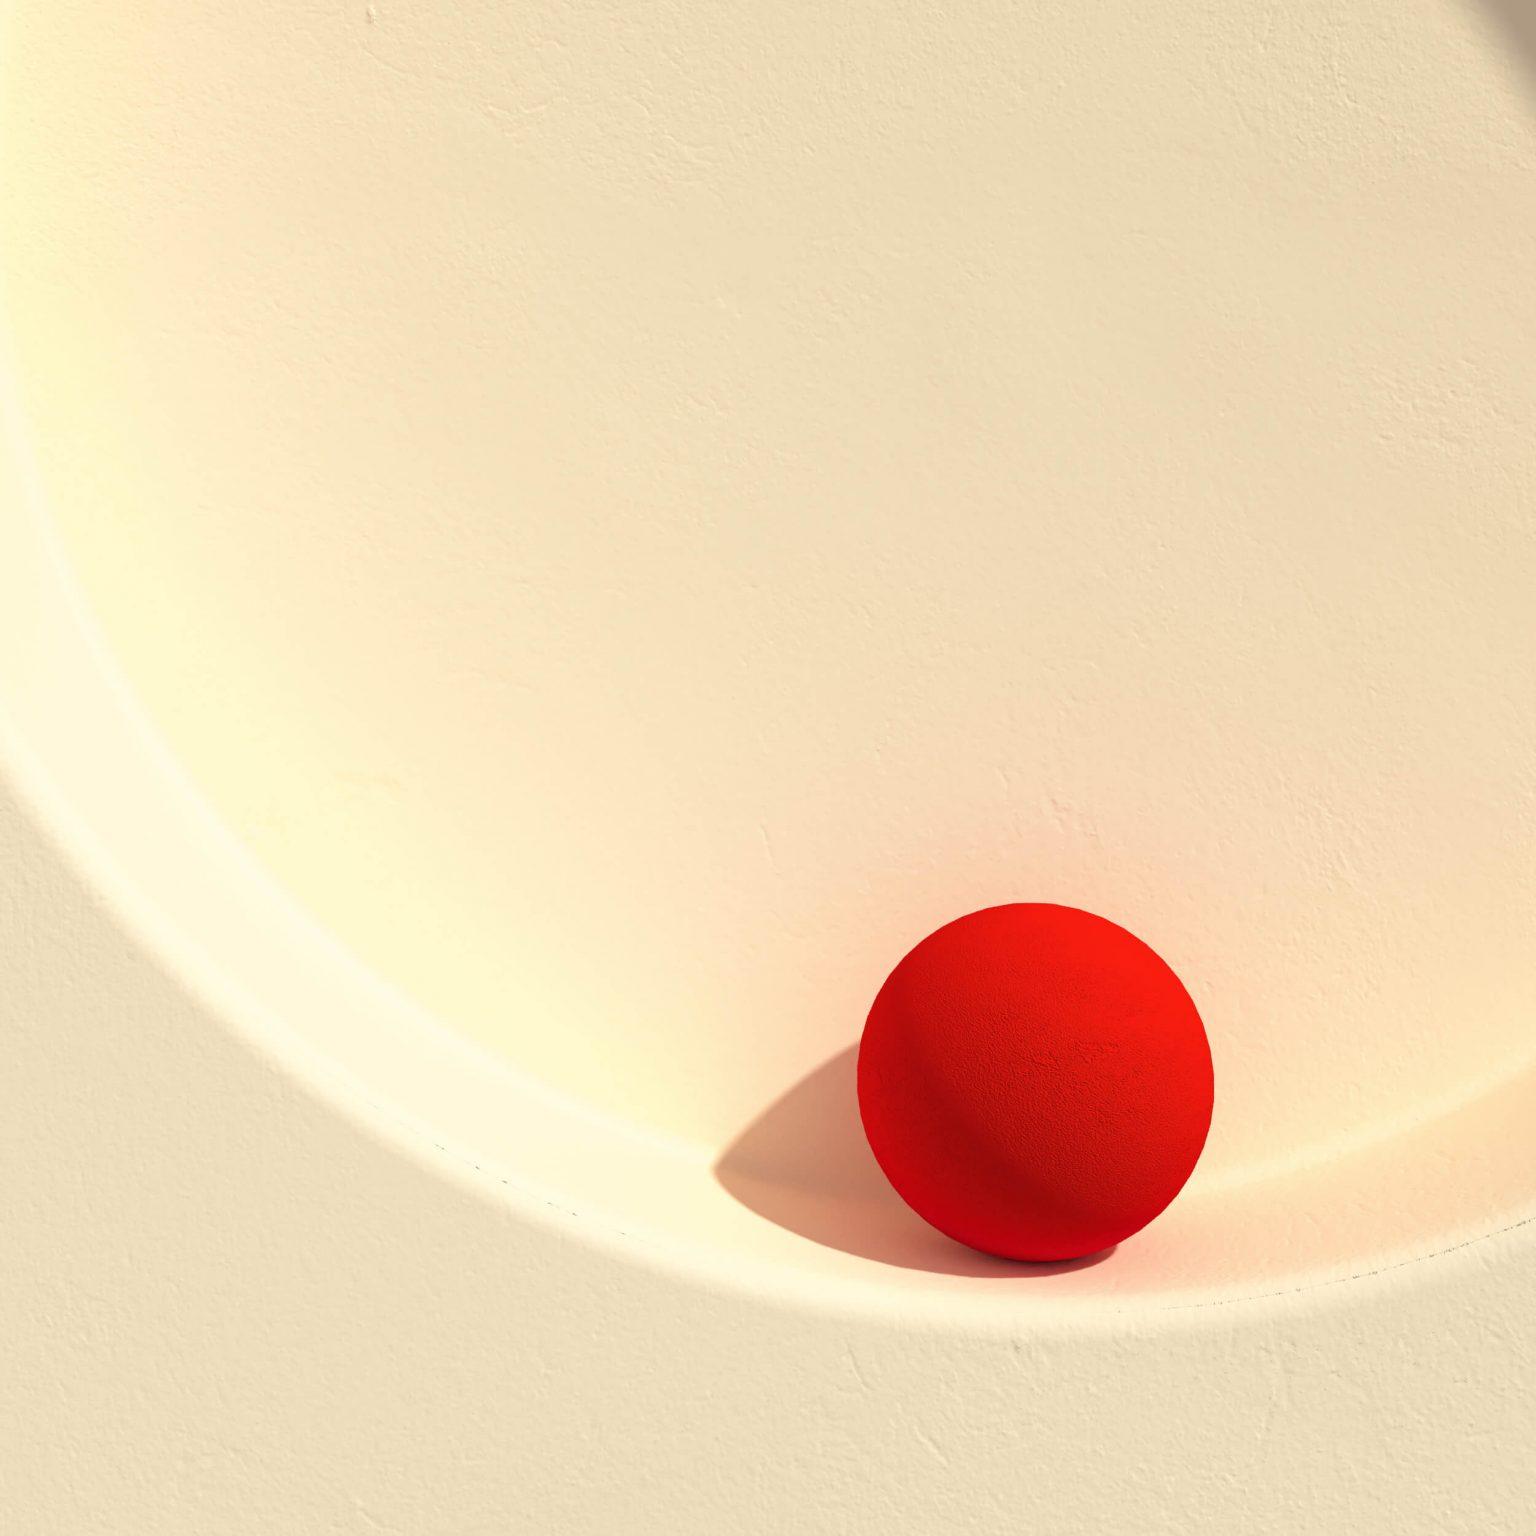 Niklas Beab Summer Ball 2 3D Design